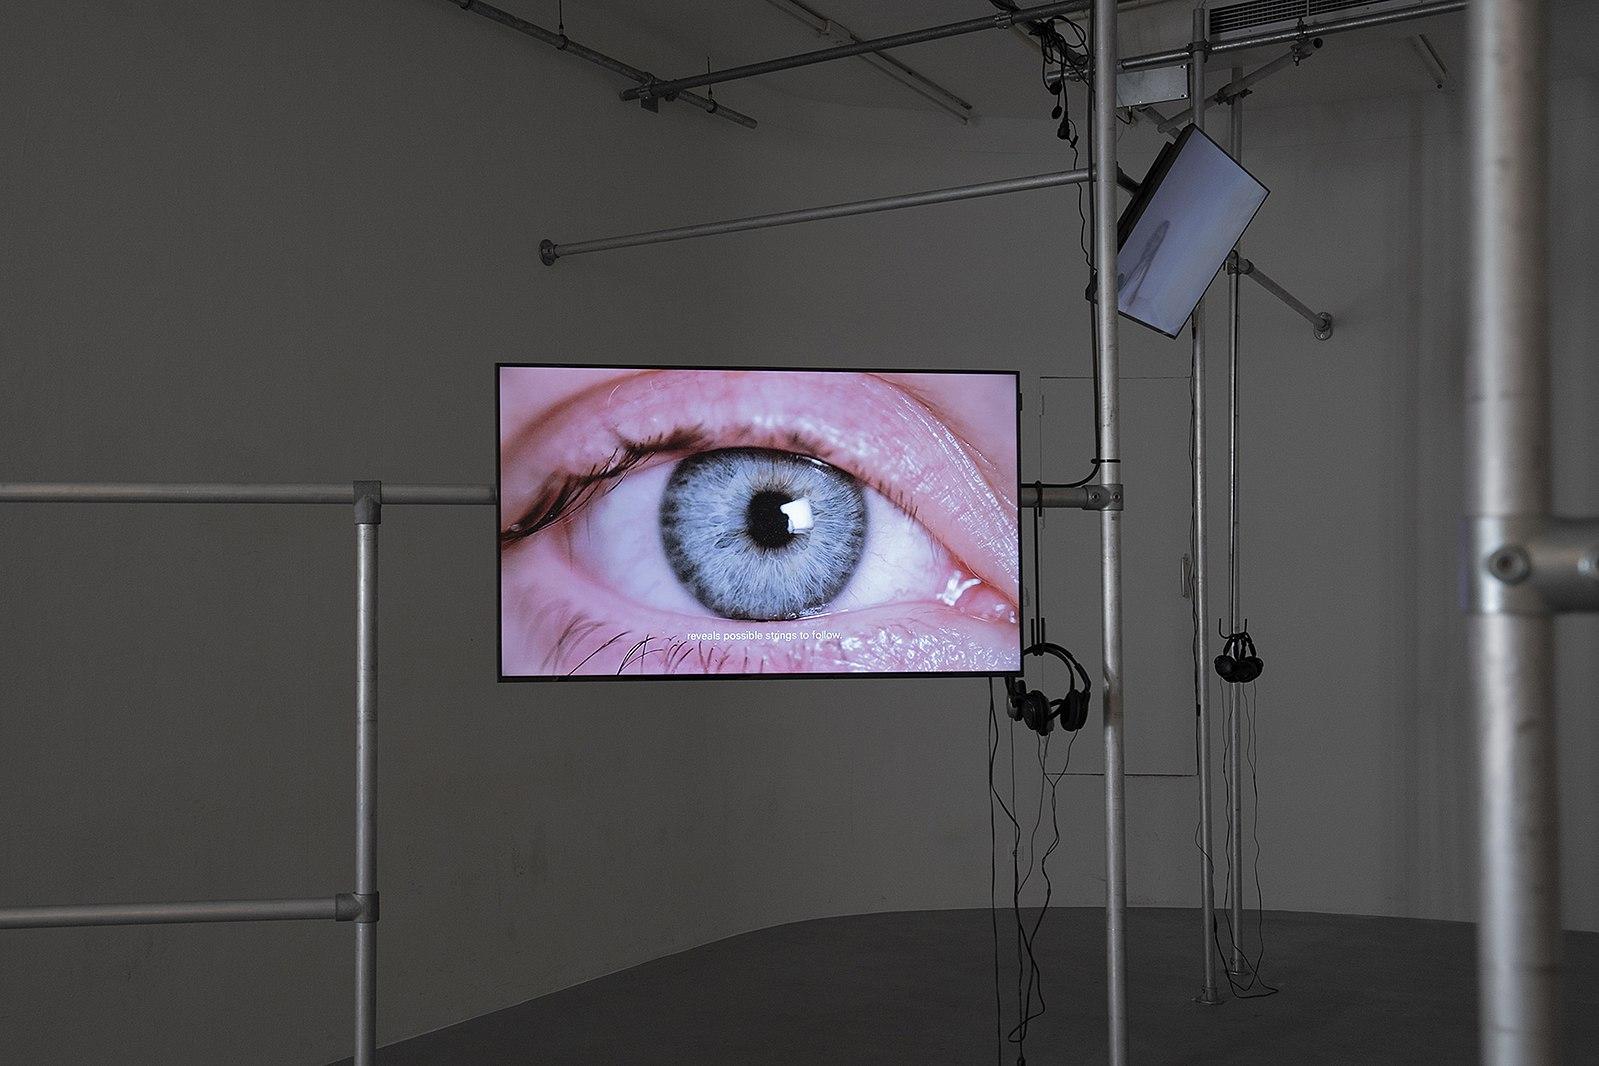 fig.4: Film Air Kiss. Five-channel video installation on festival Ipakt, Utrecht, Netherlands. 2018